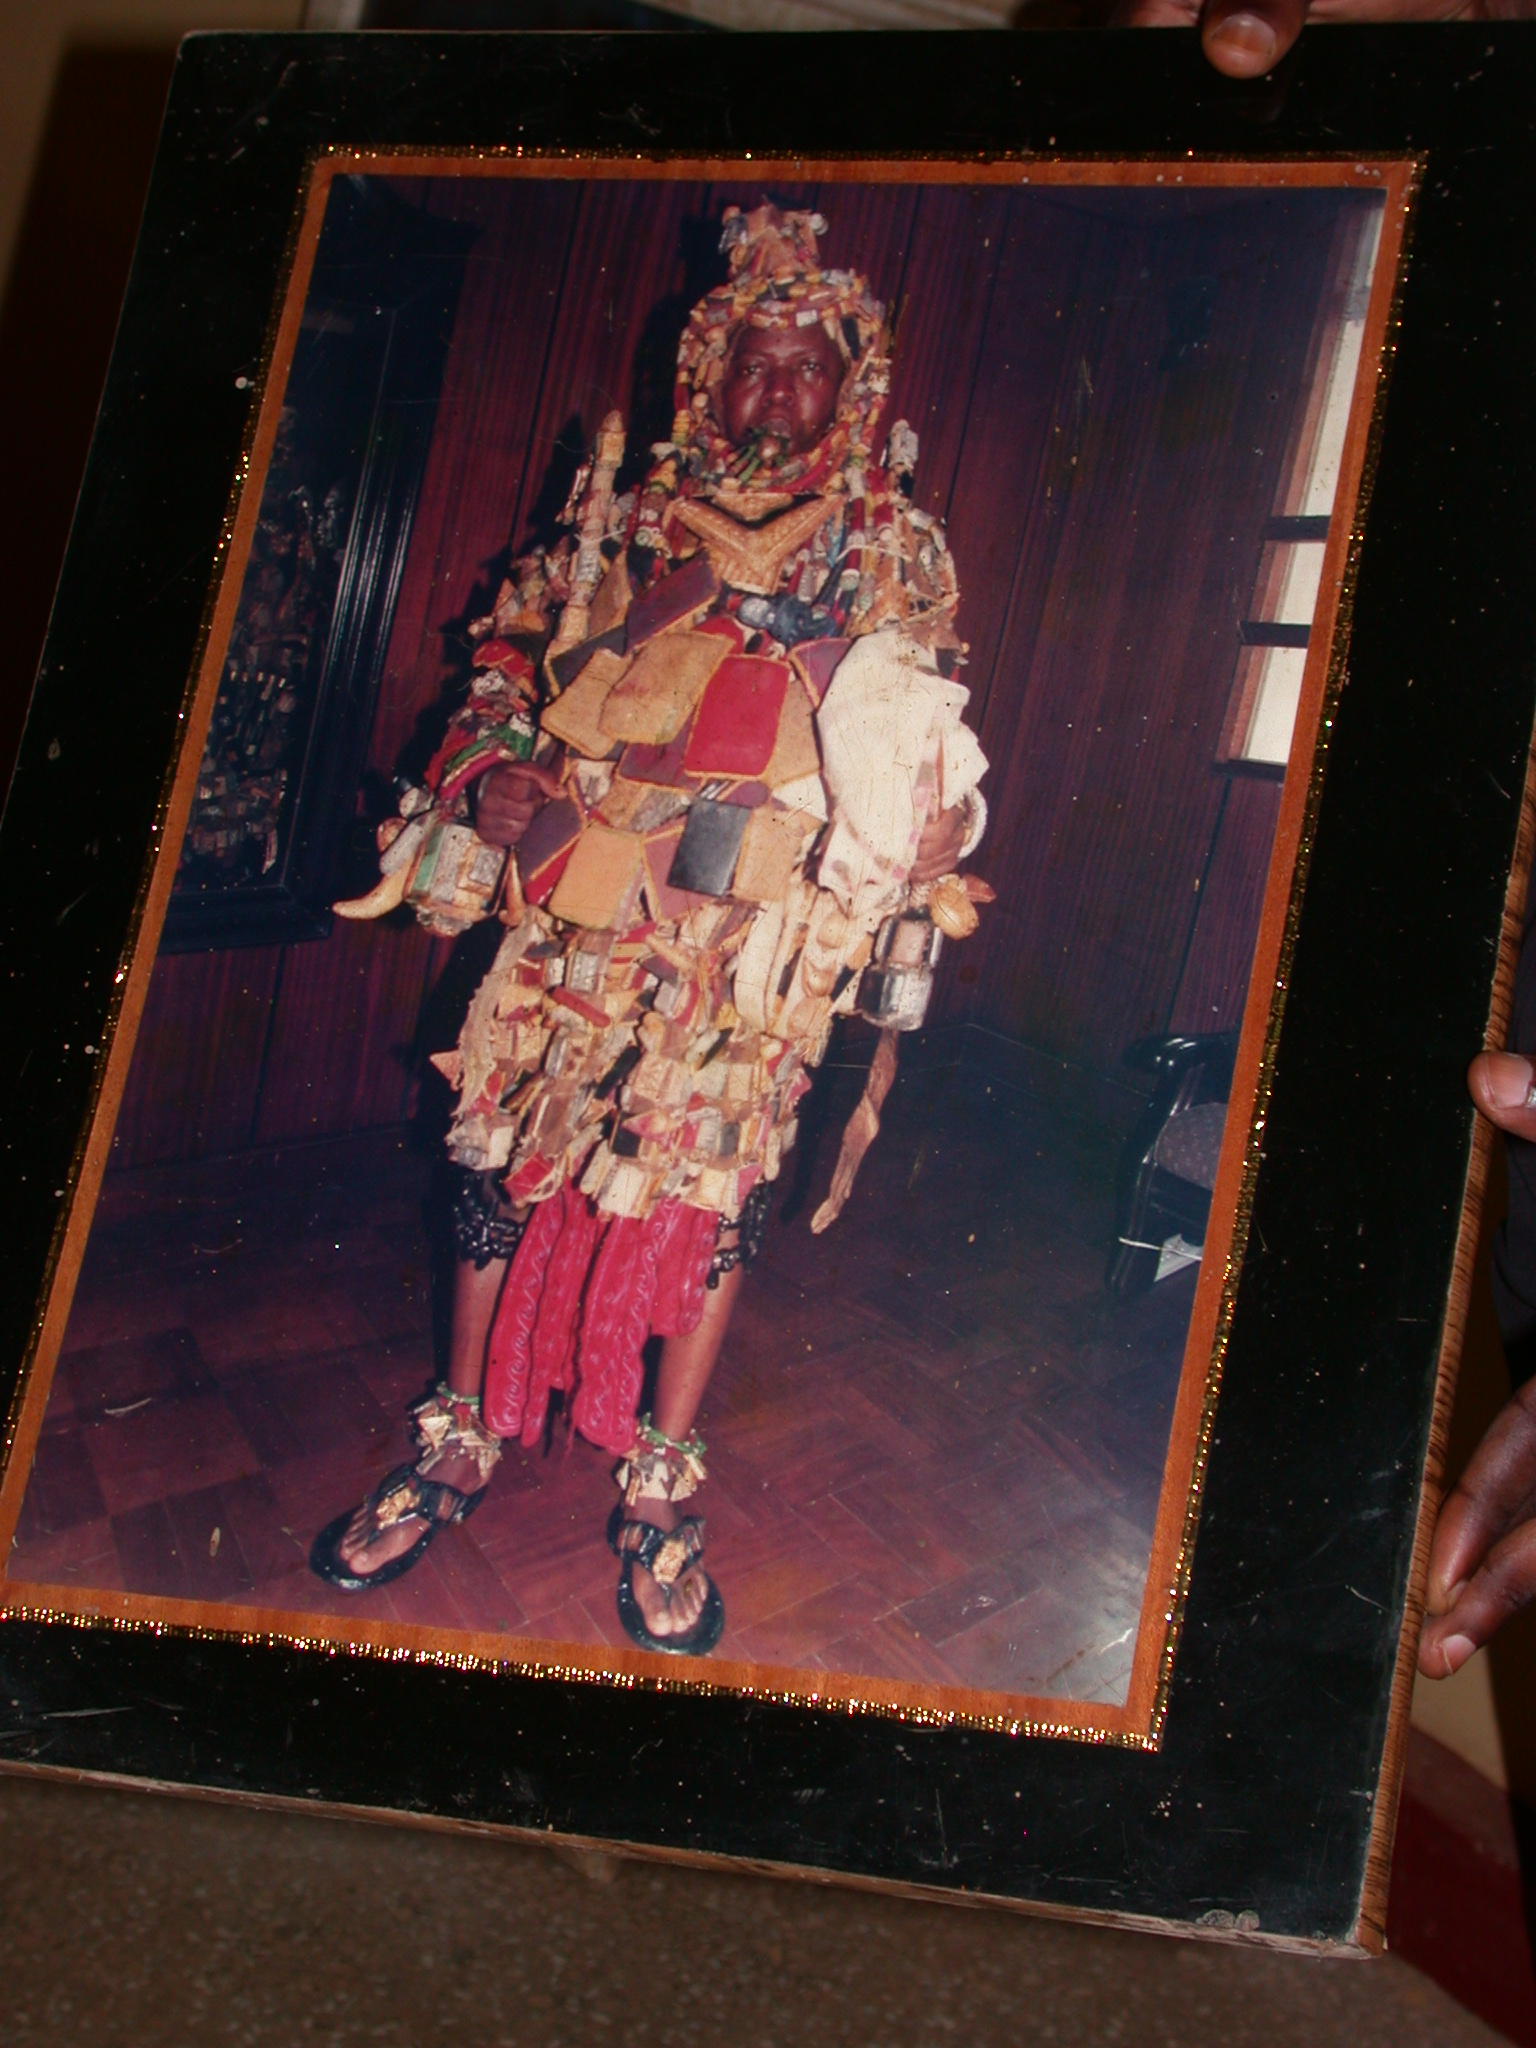 Photograph of Asante King in Magical Garment, Okomfo Anokye Sword Site, Kumasi, Ghana